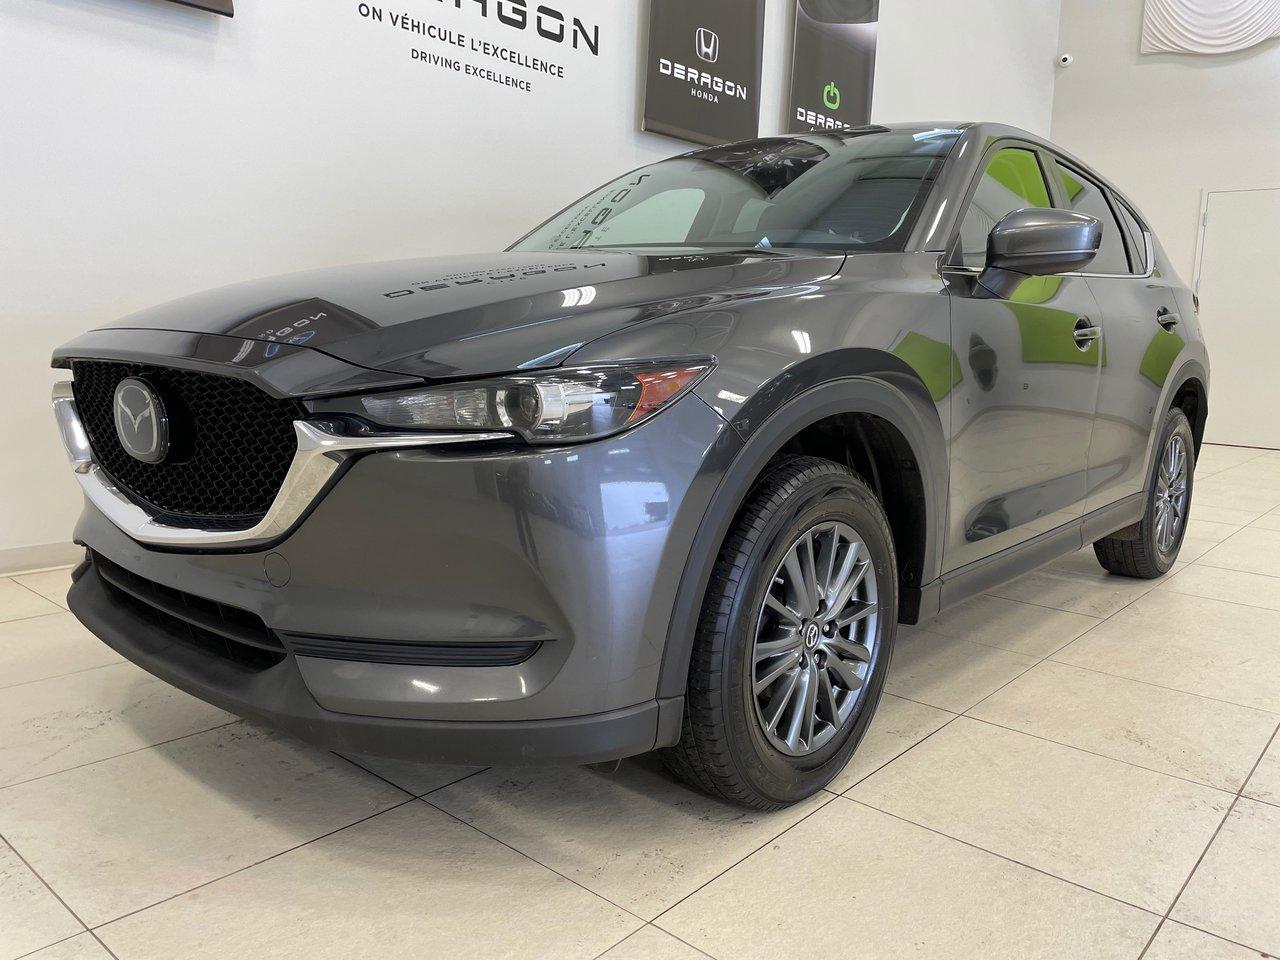 Mazda CX-5 2019 GS AWD, CUIR, ASSISTANCE CONDUITE, APPLE CARP